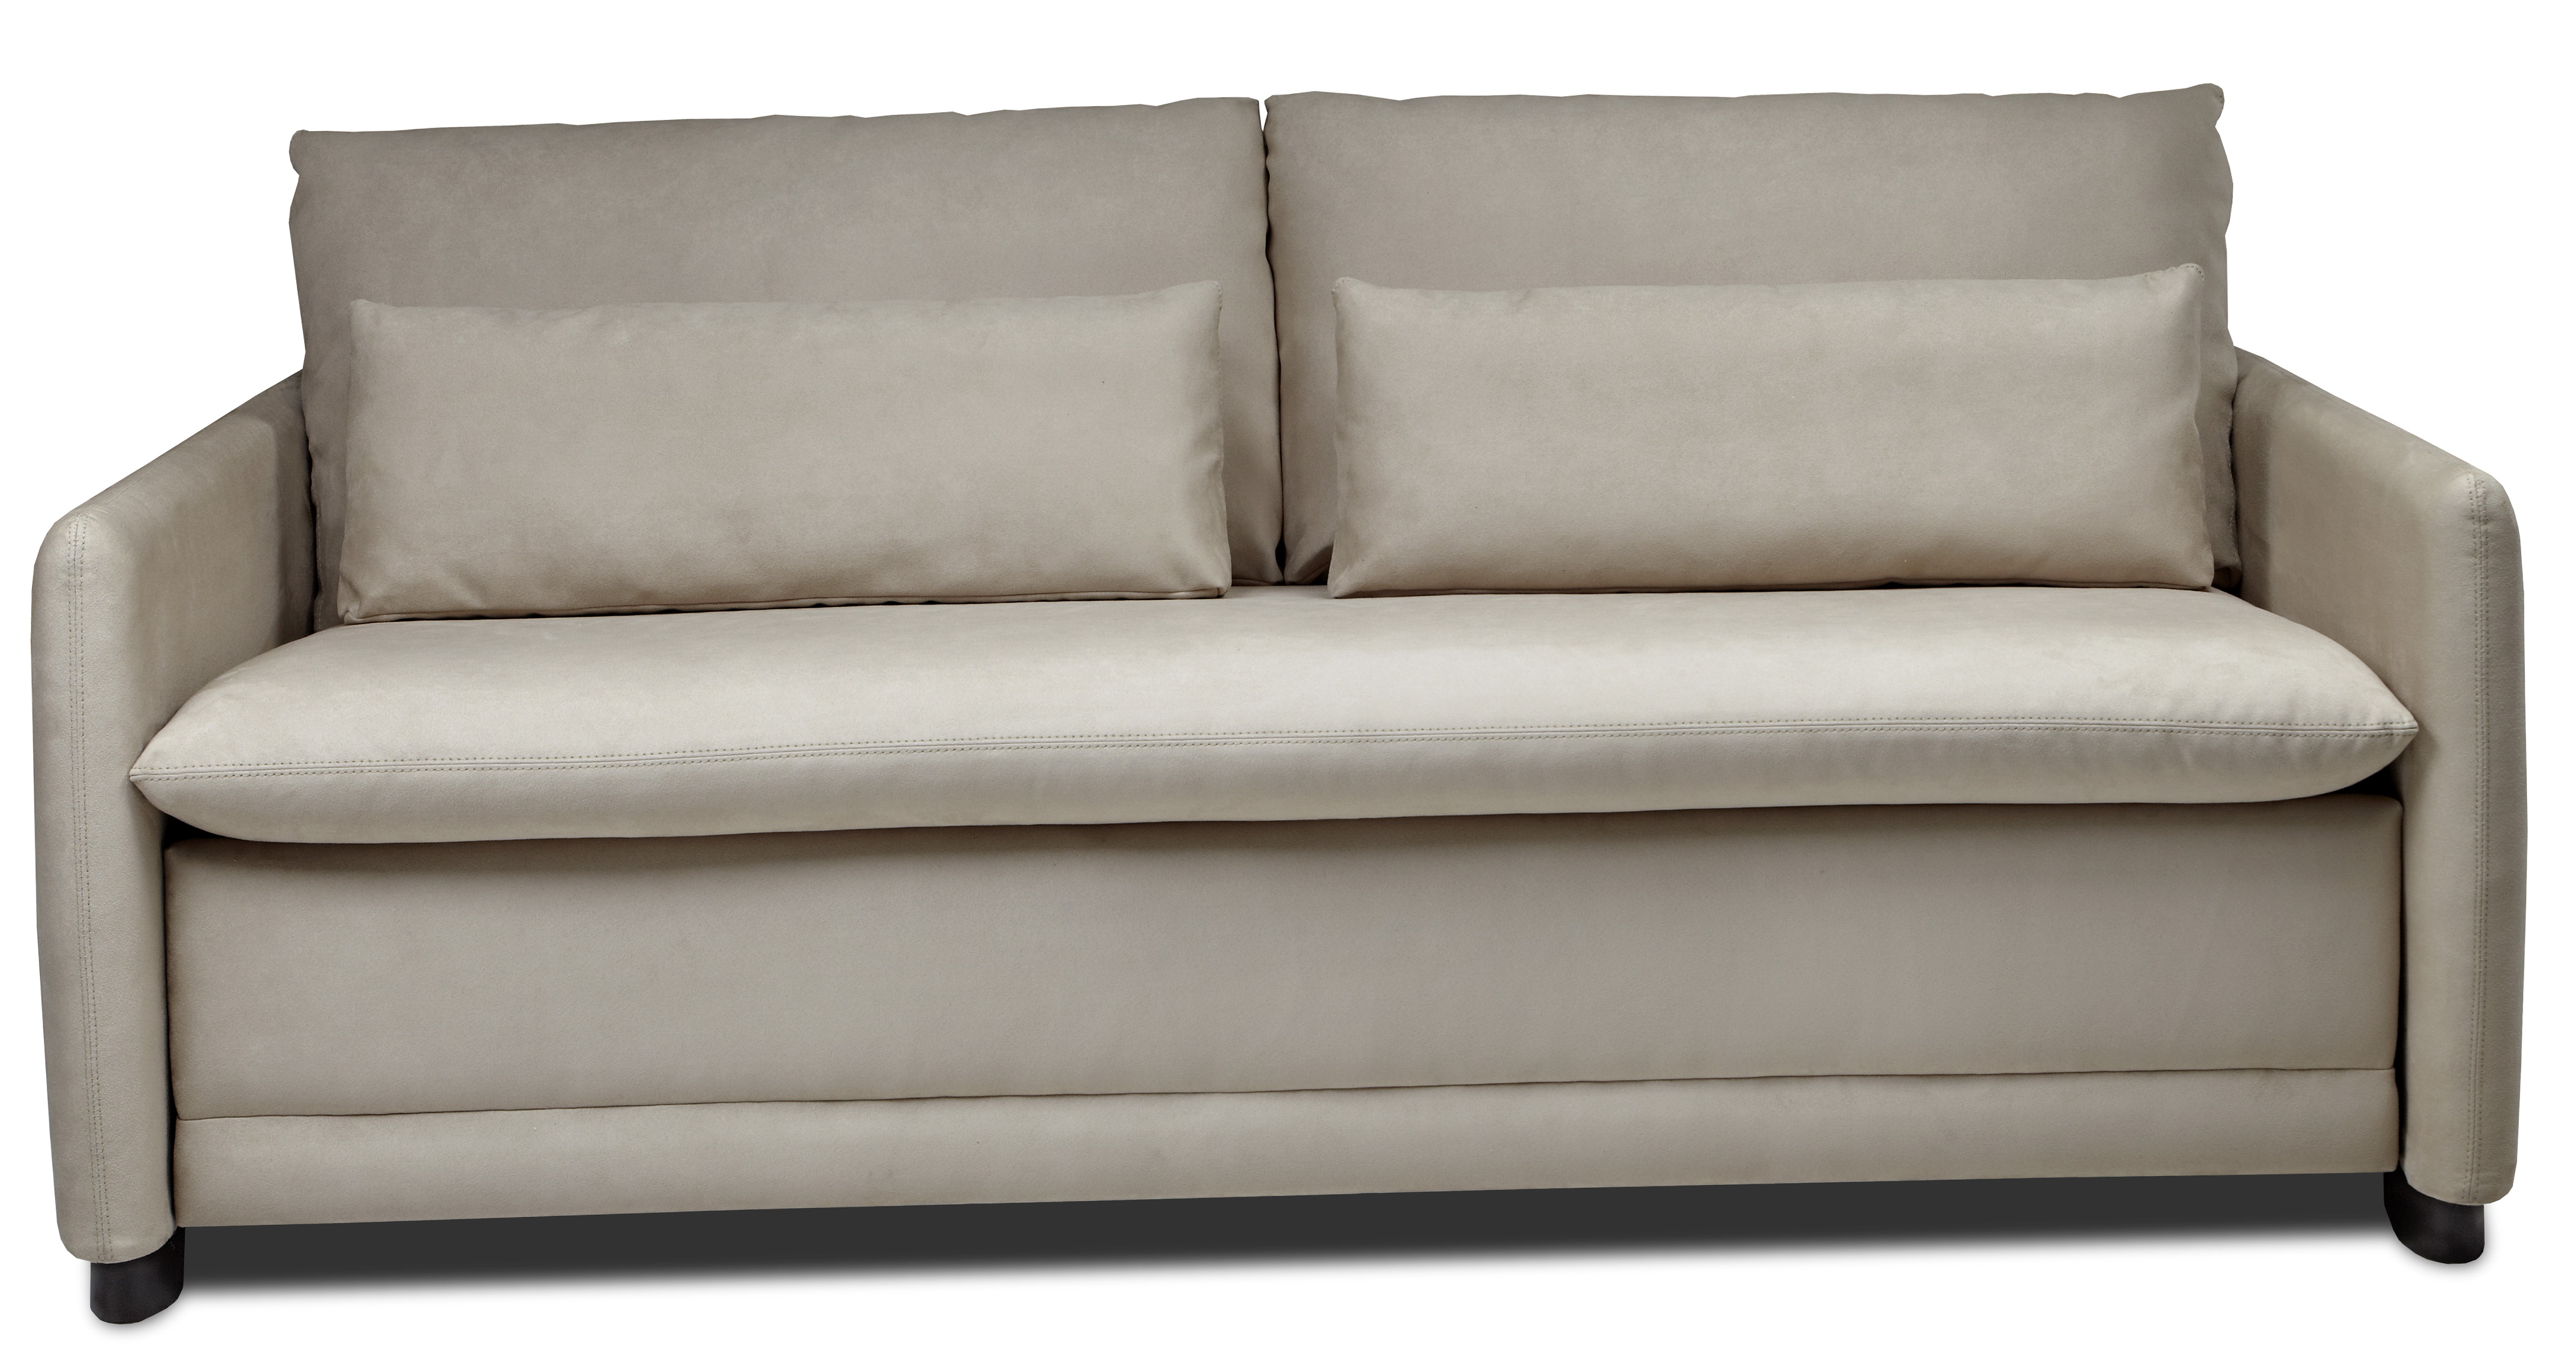 Twin Sofa Sleeper Jcpenney